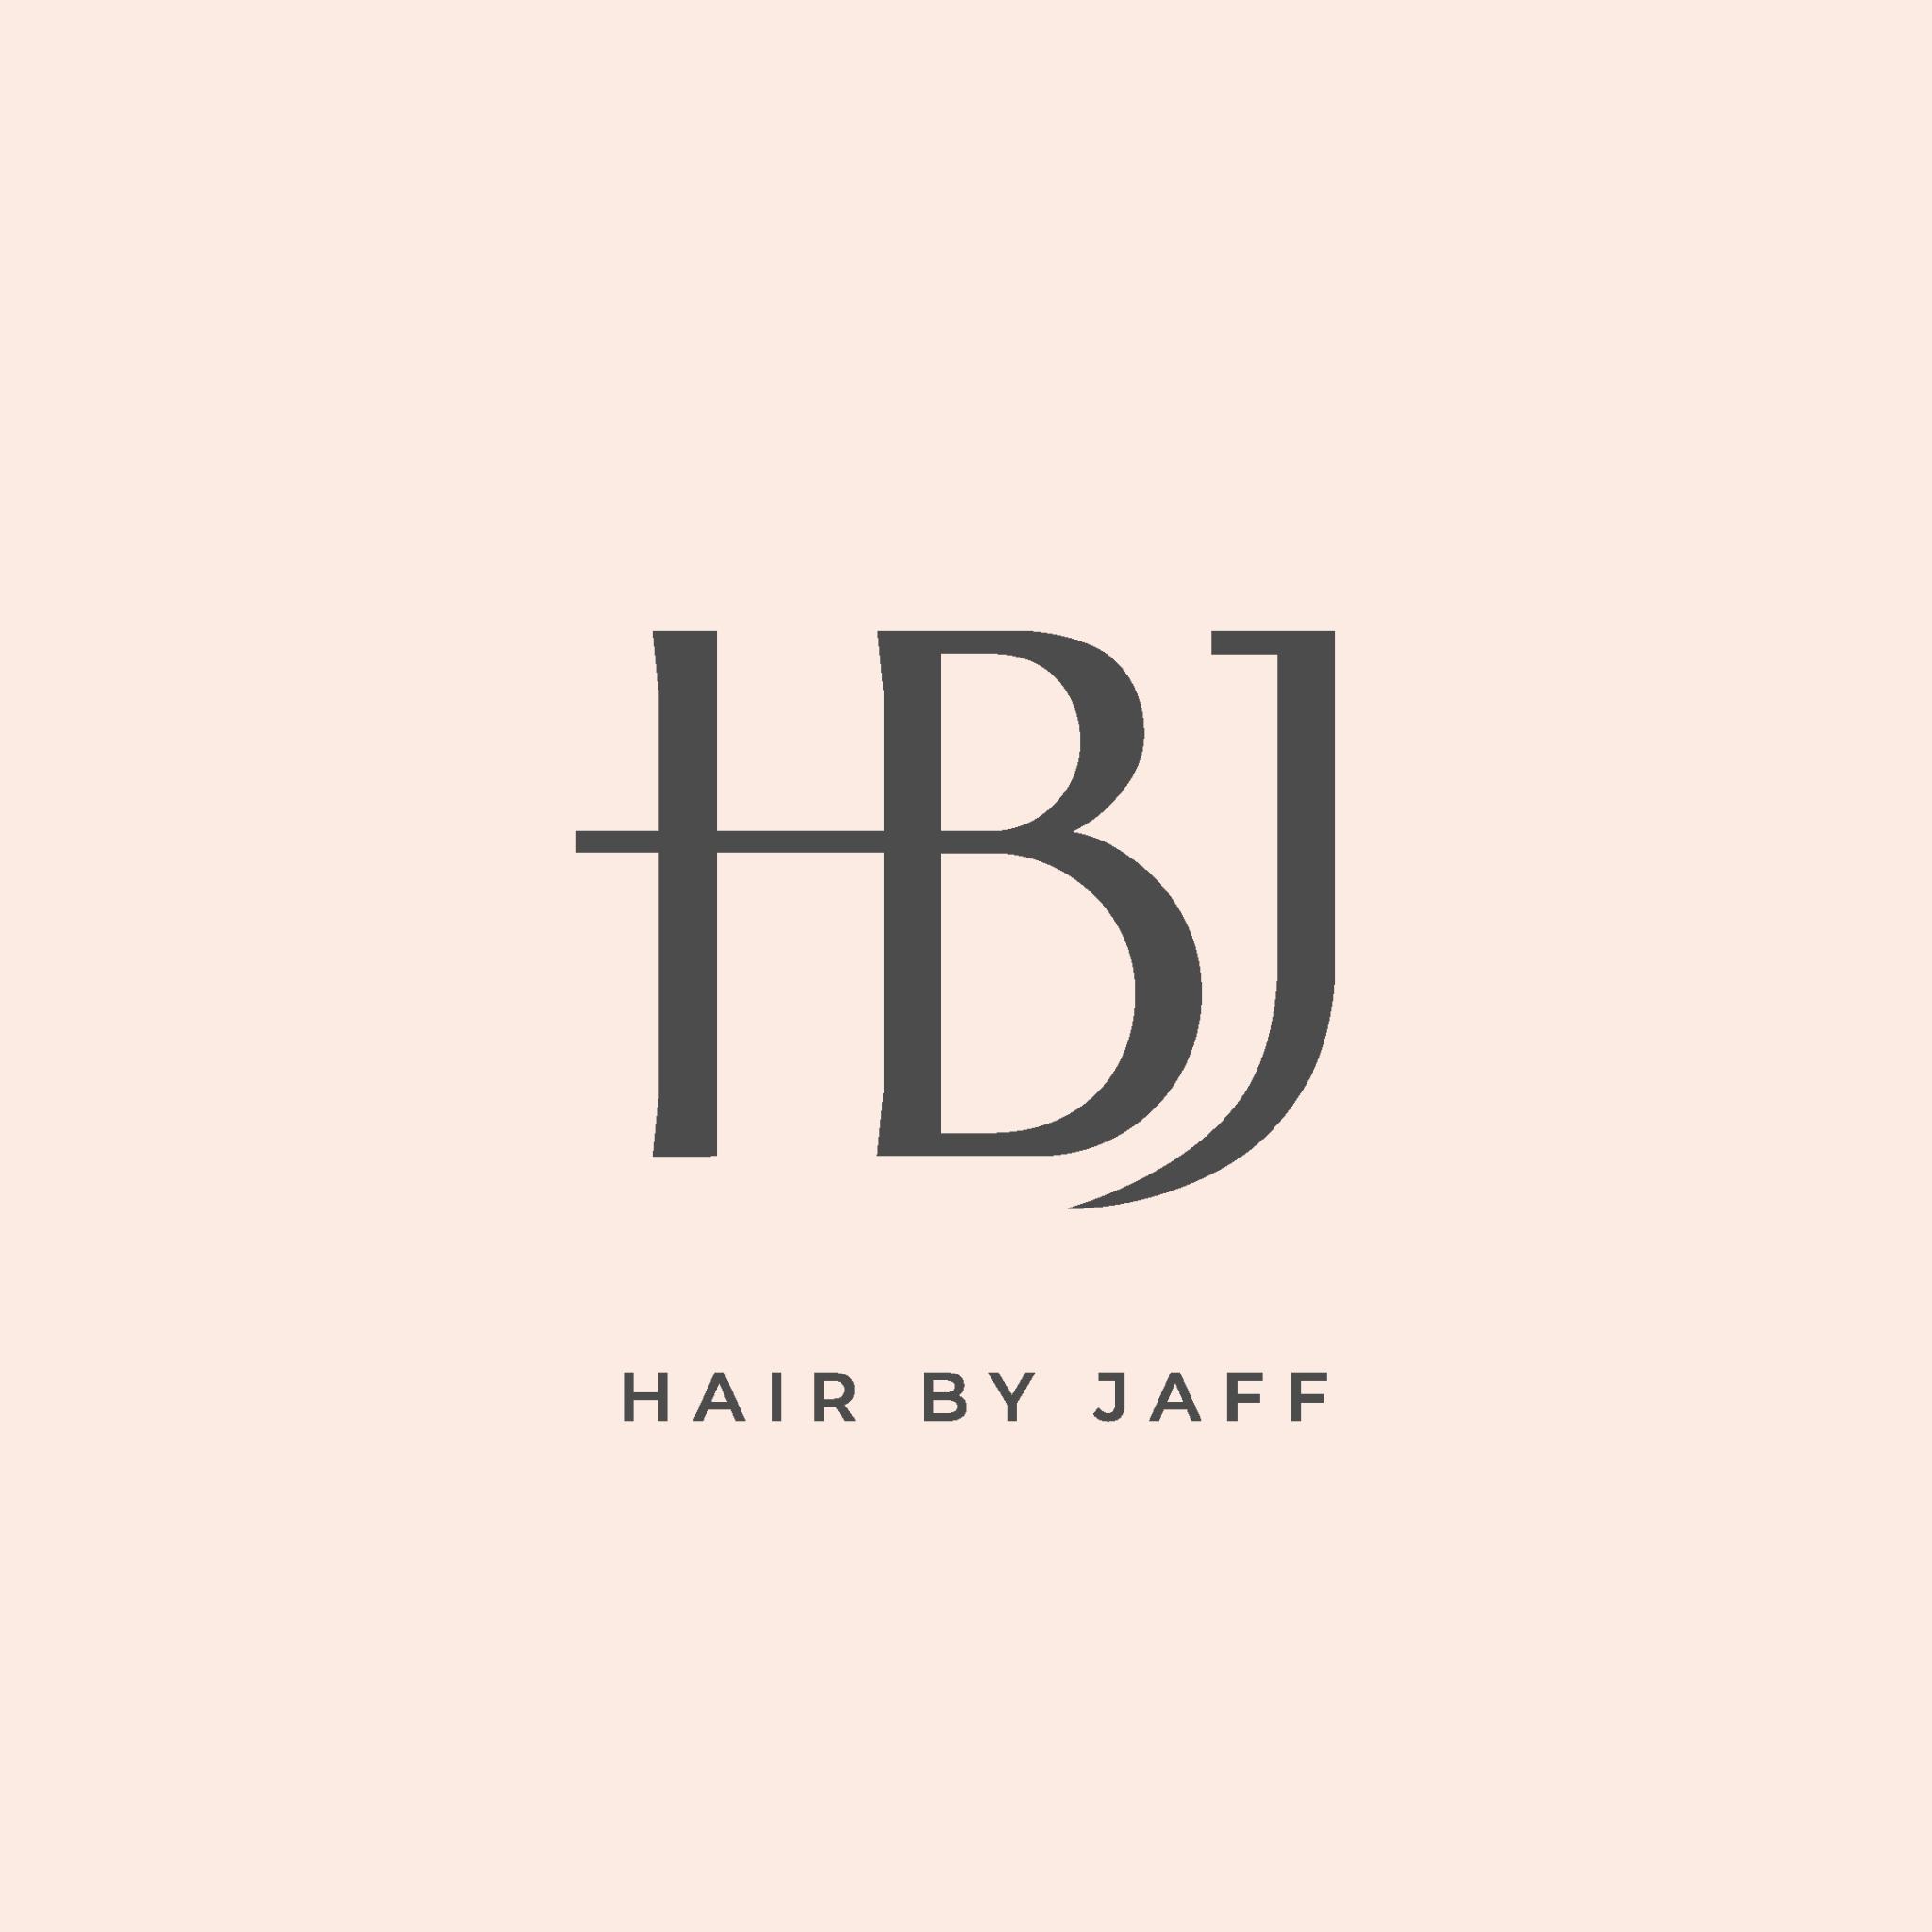 hairbyjafflogo2_Plan de travail 1